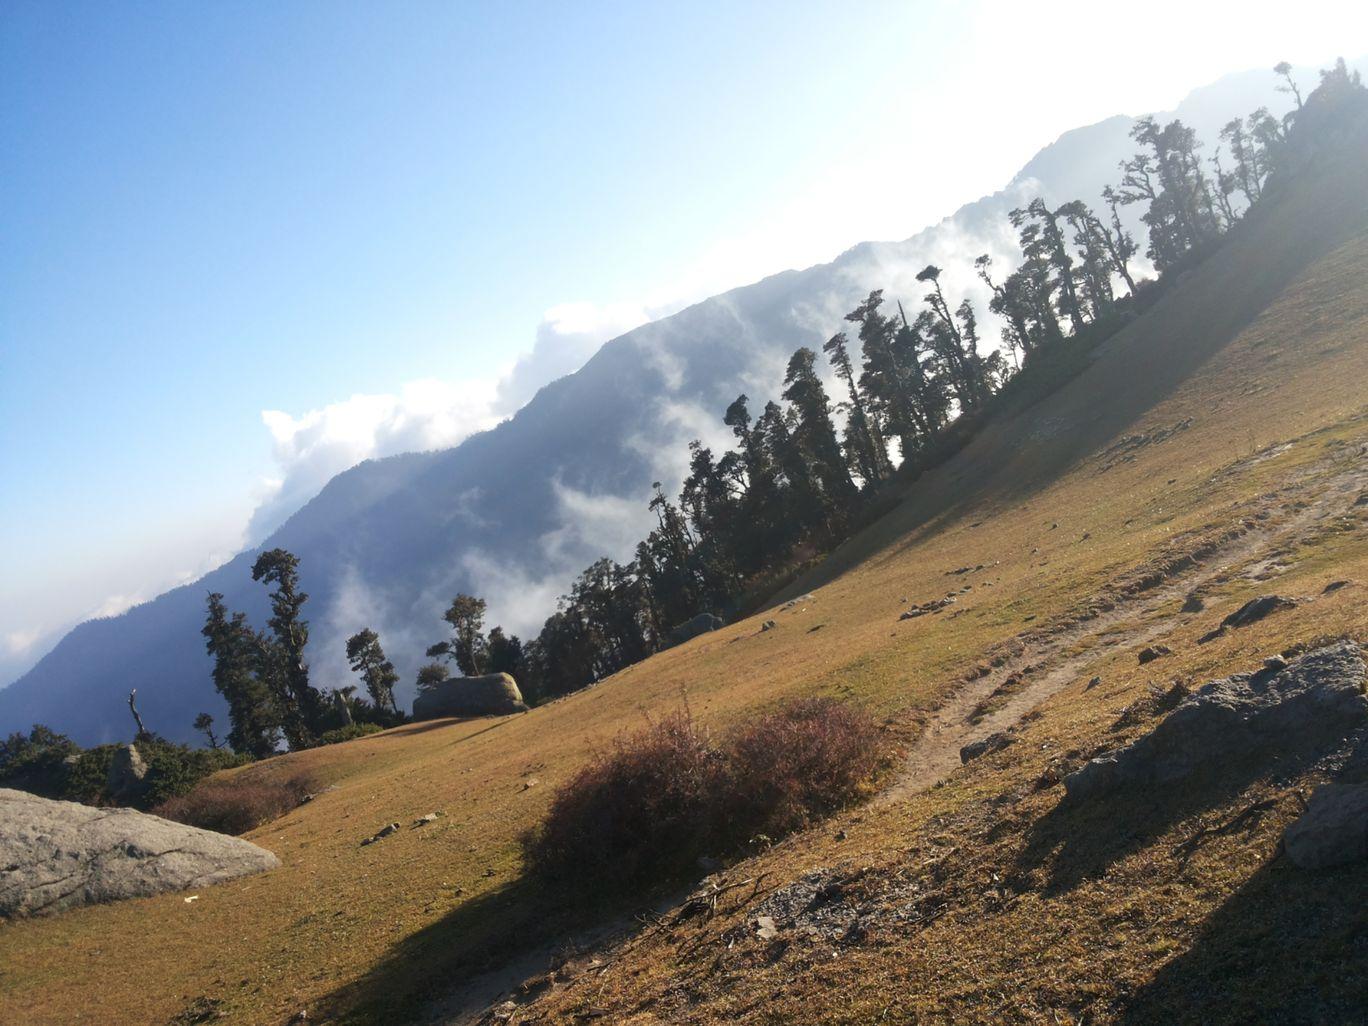 Photo of Churdhar By Snehil Soni